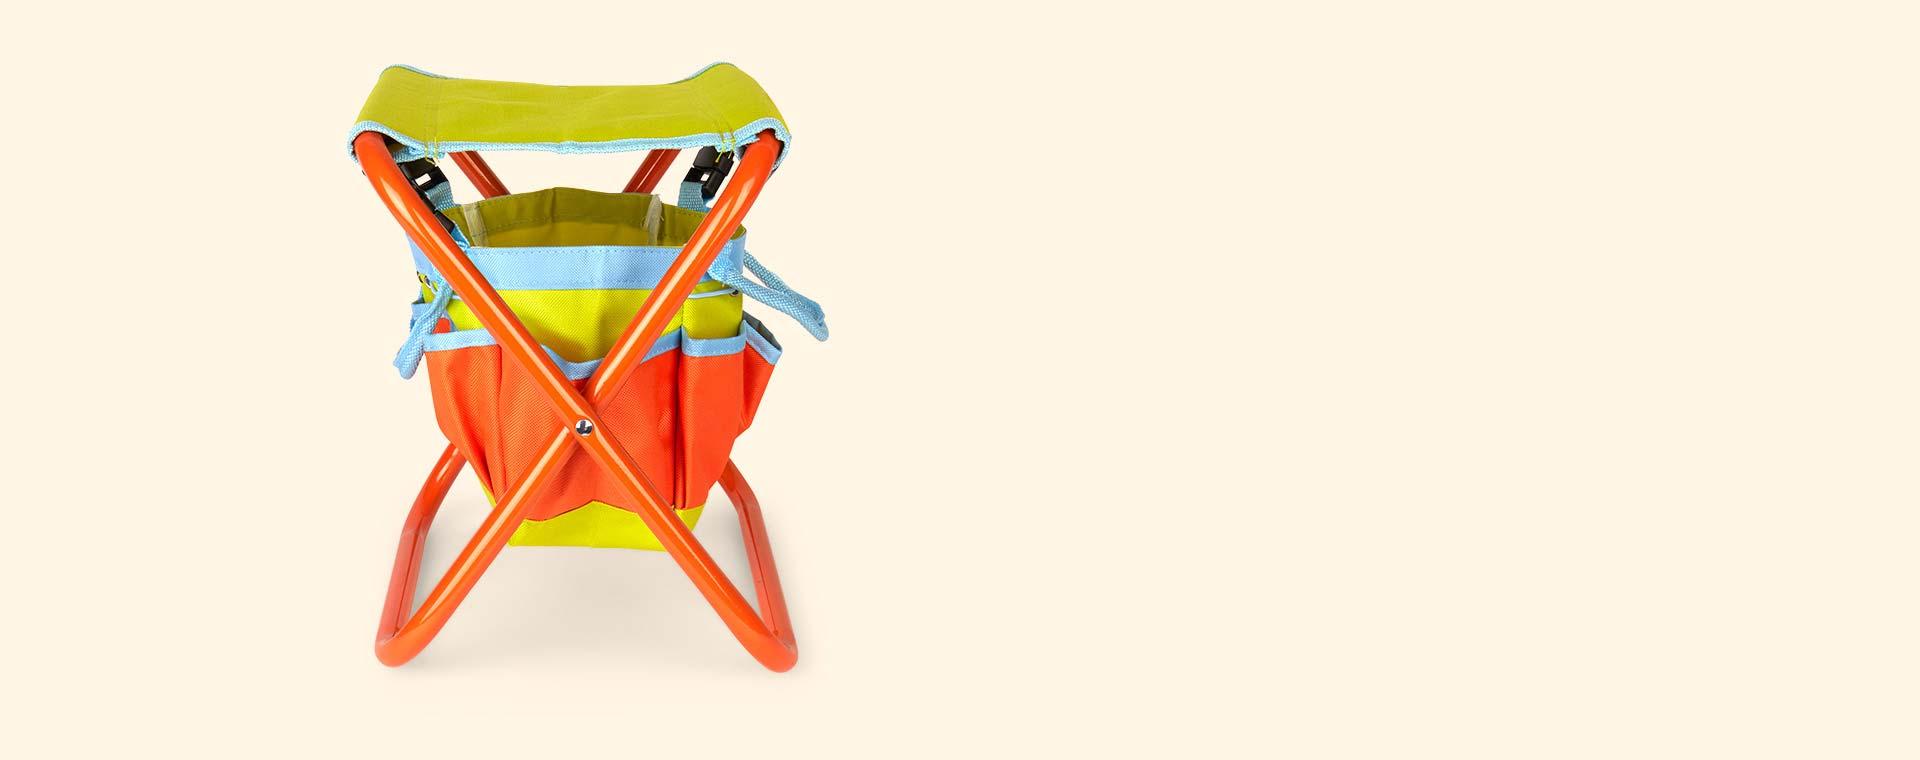 Orange & Green Briers Folding Seat